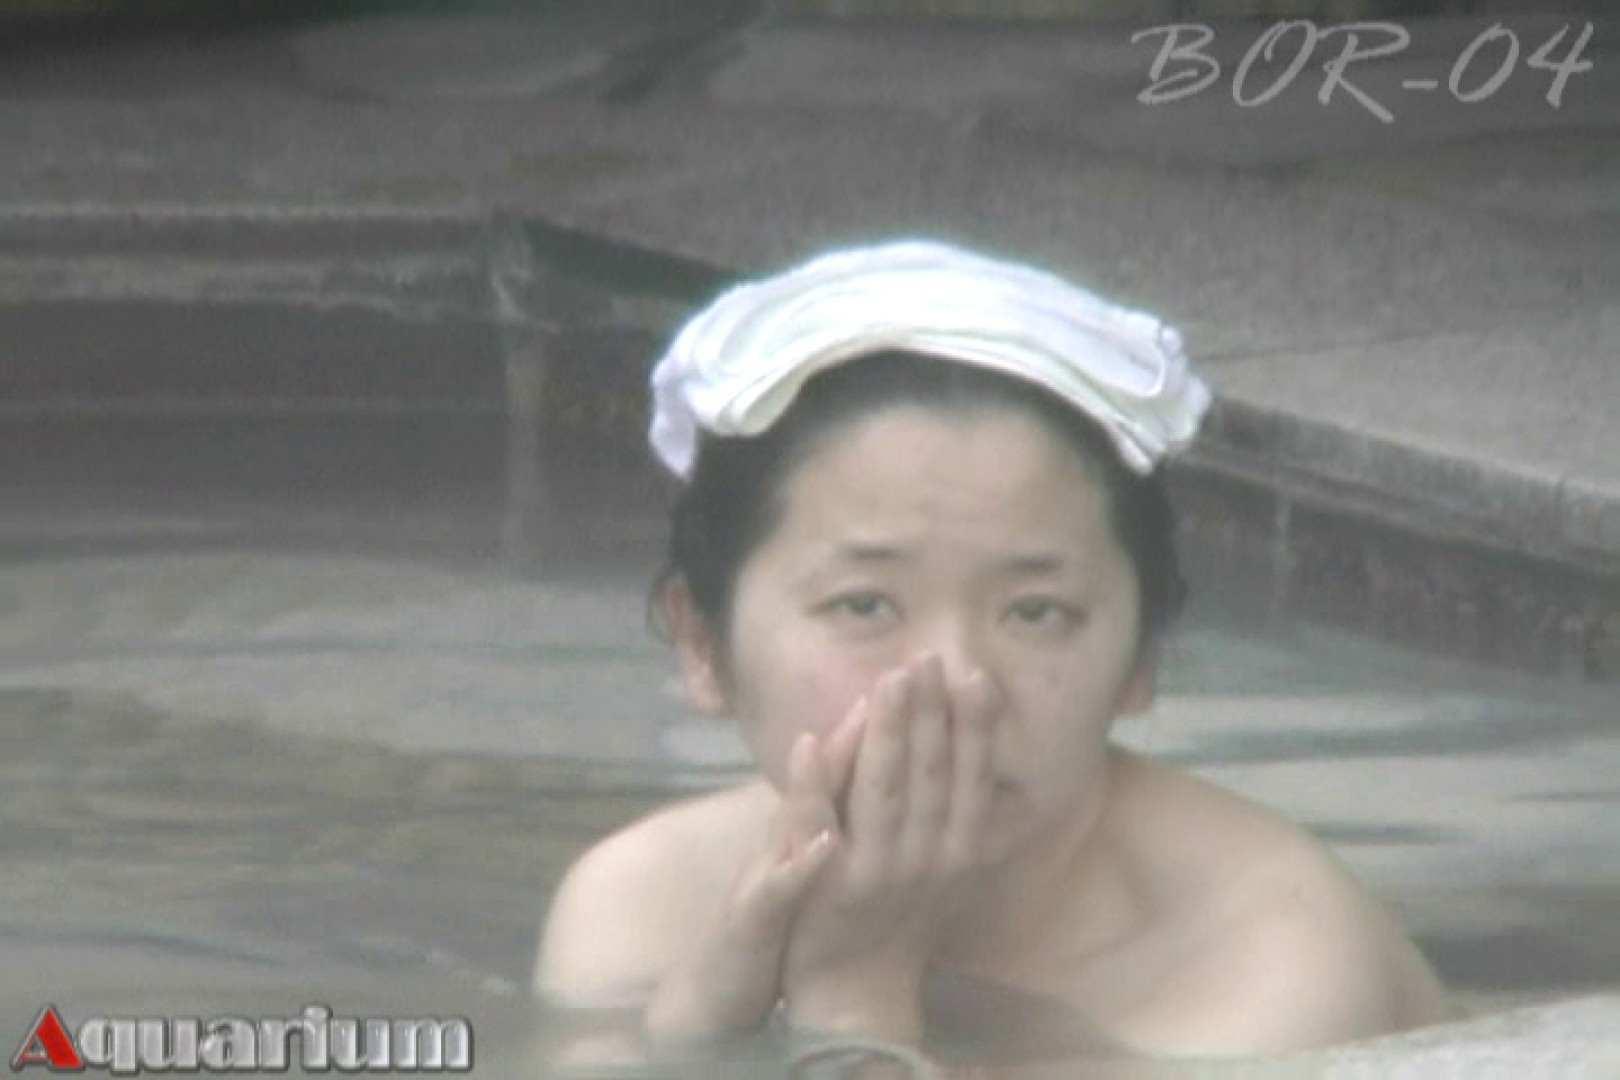 Aquaな露天風呂Vol.506 盗撮 のぞき動画画像 99連発 80